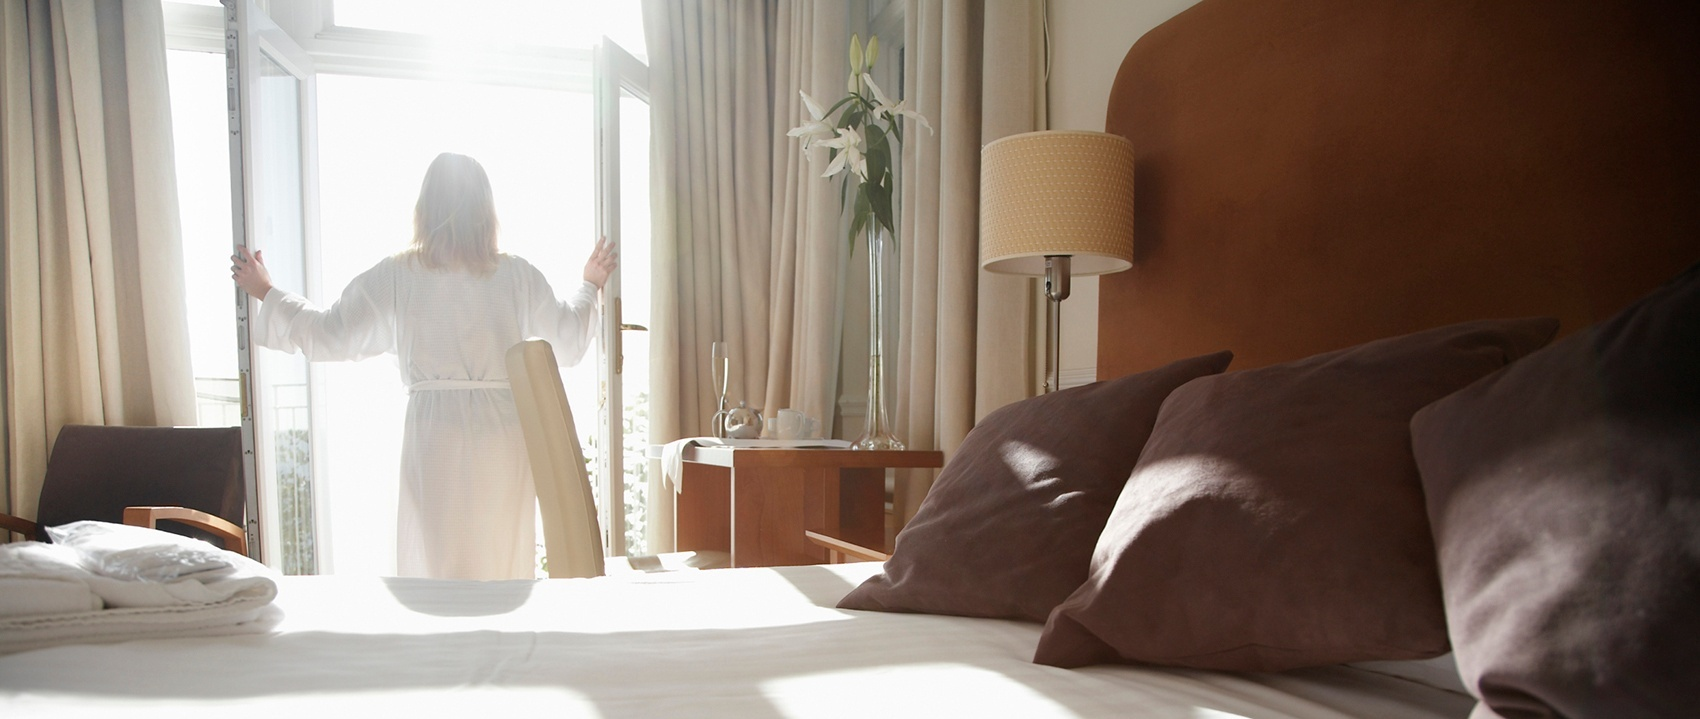 4 Ways Luxury Travel is Being Redefined.jpg